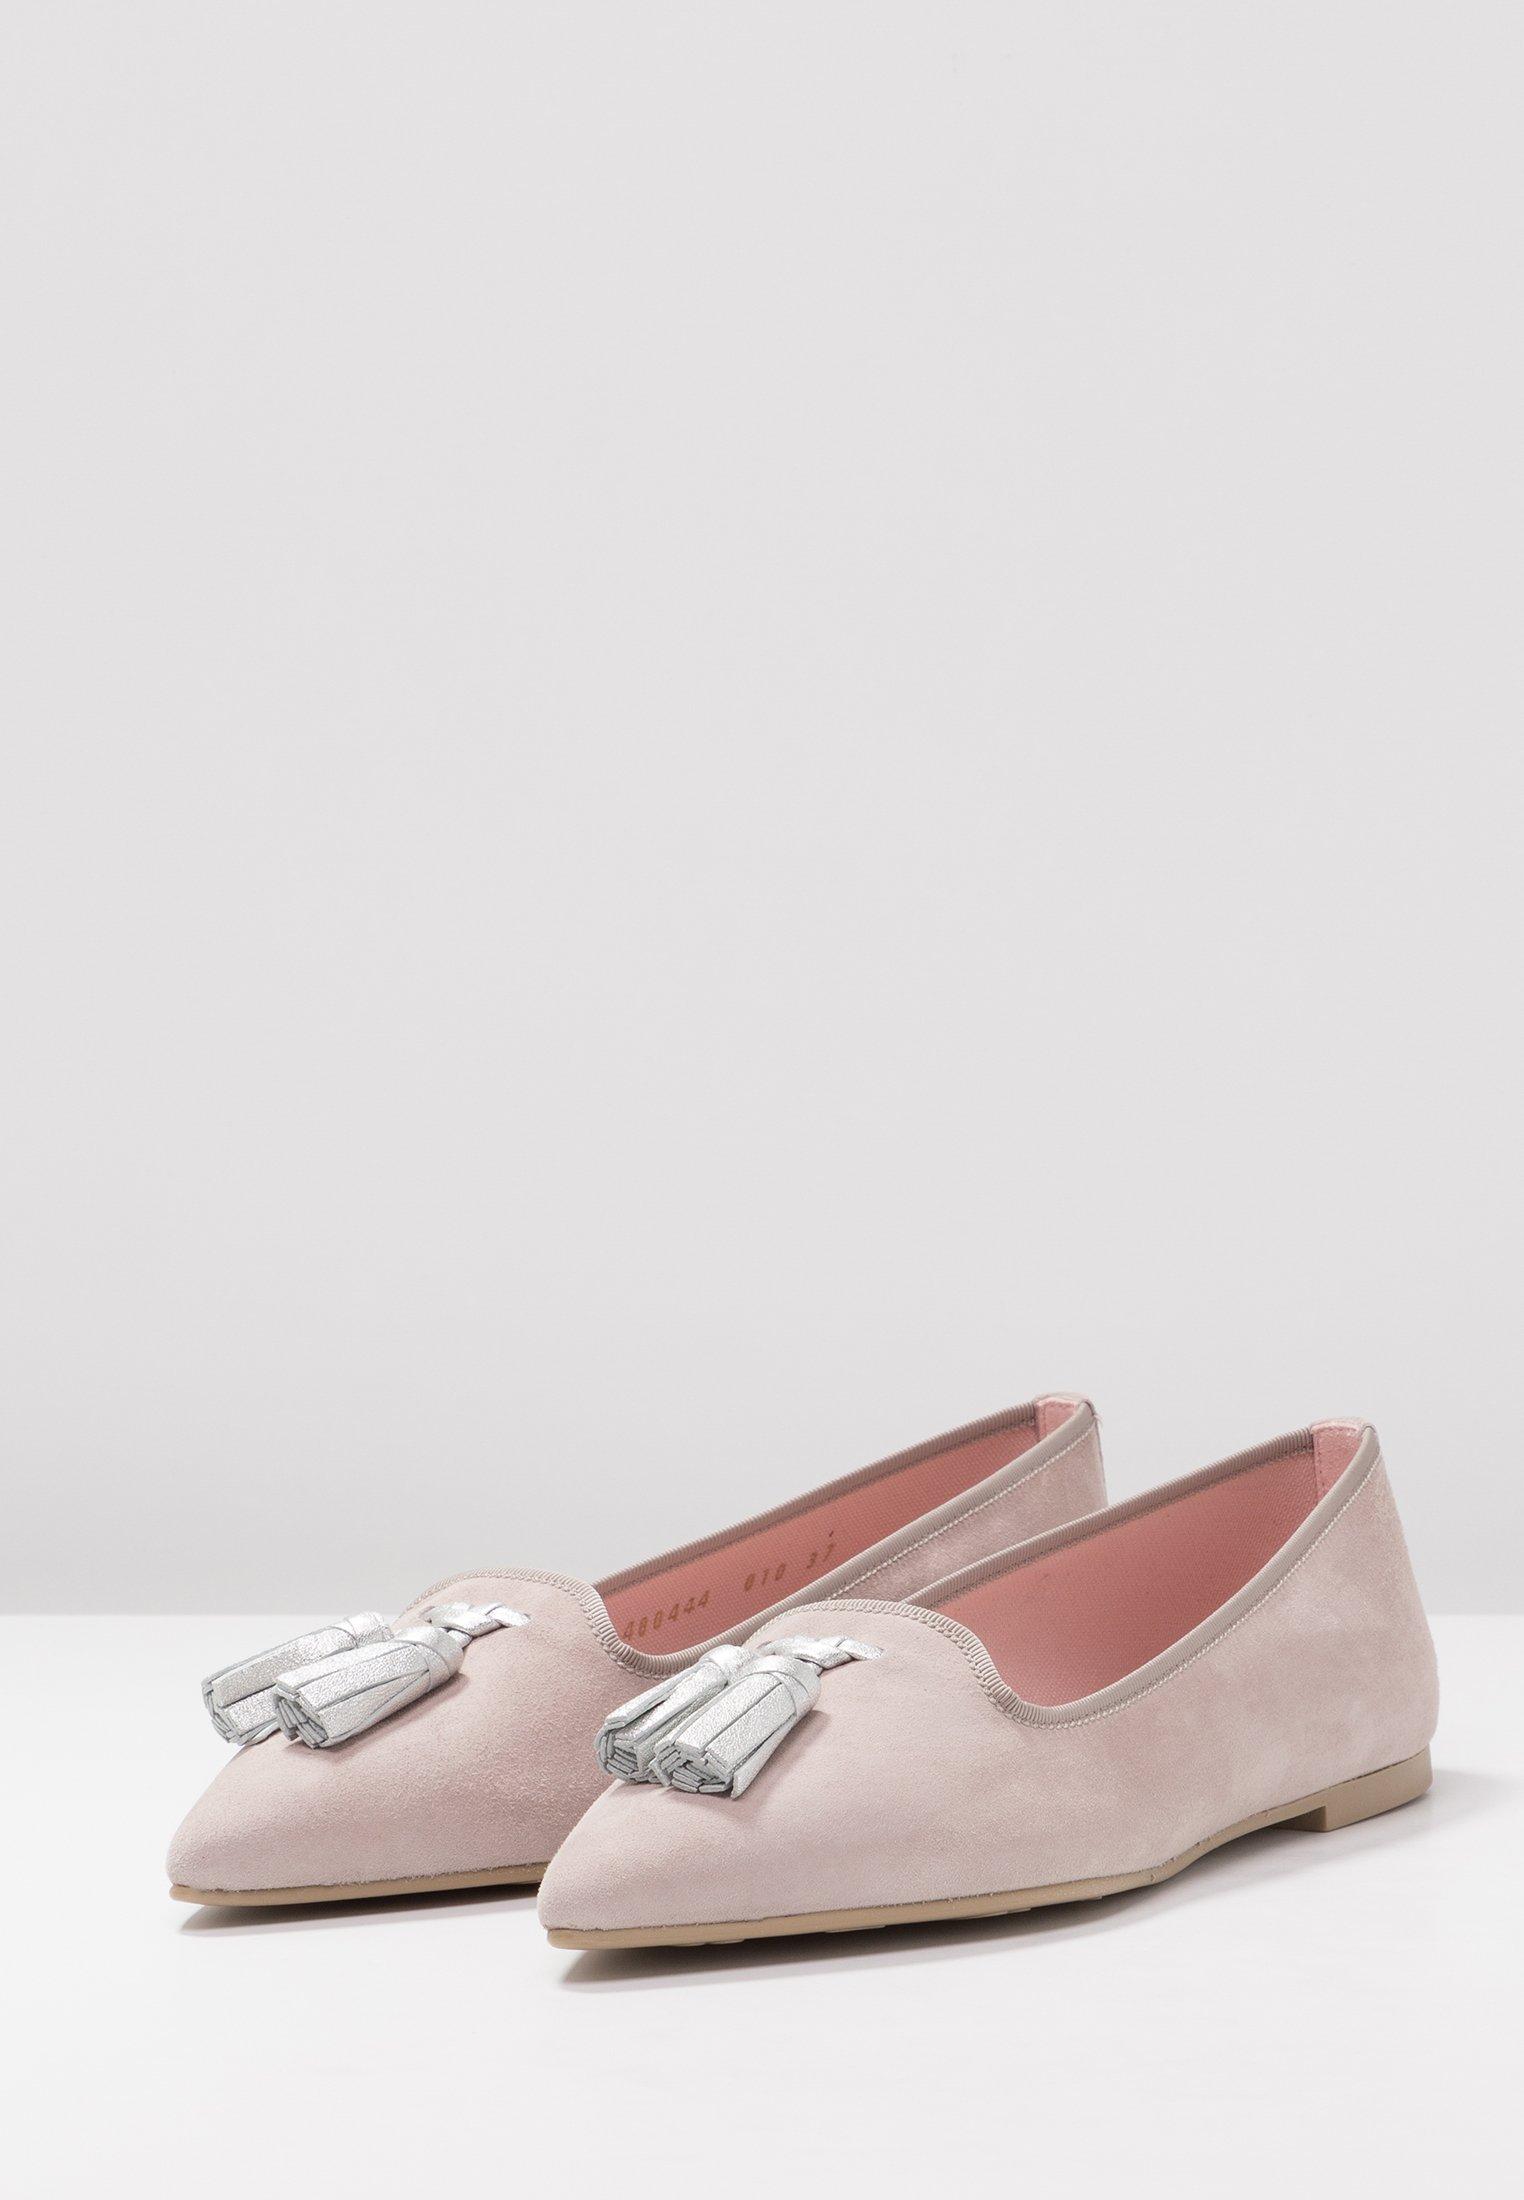 Pretty Ballerinas ANGELIS - Półbuty wsuwane - angelis hasyr/ami plata